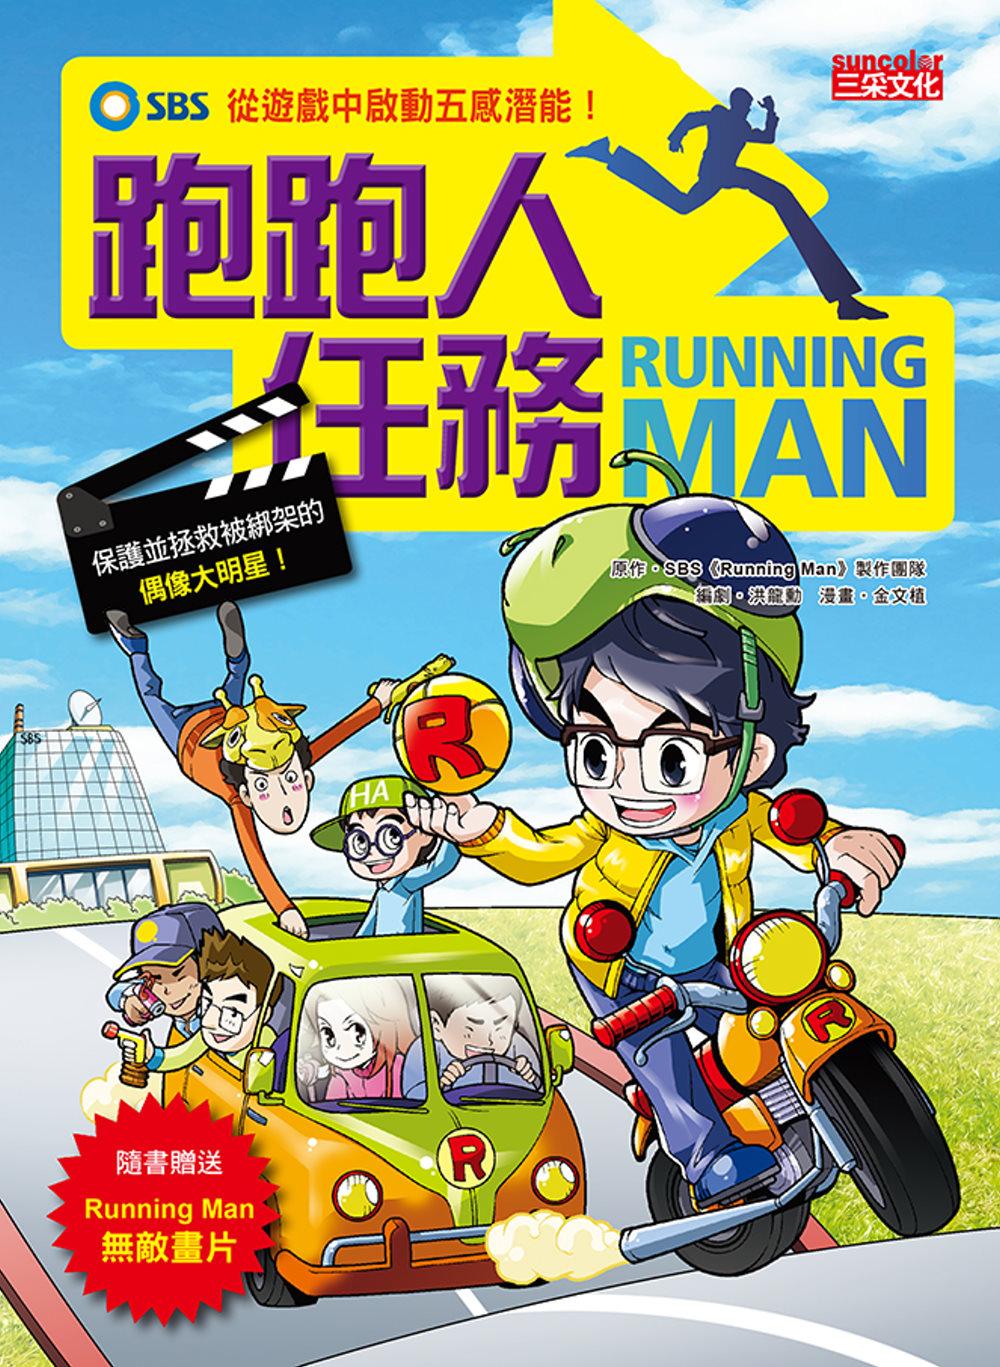 Running Man跑跑人任務:從遊戲中啟動五感潛能!